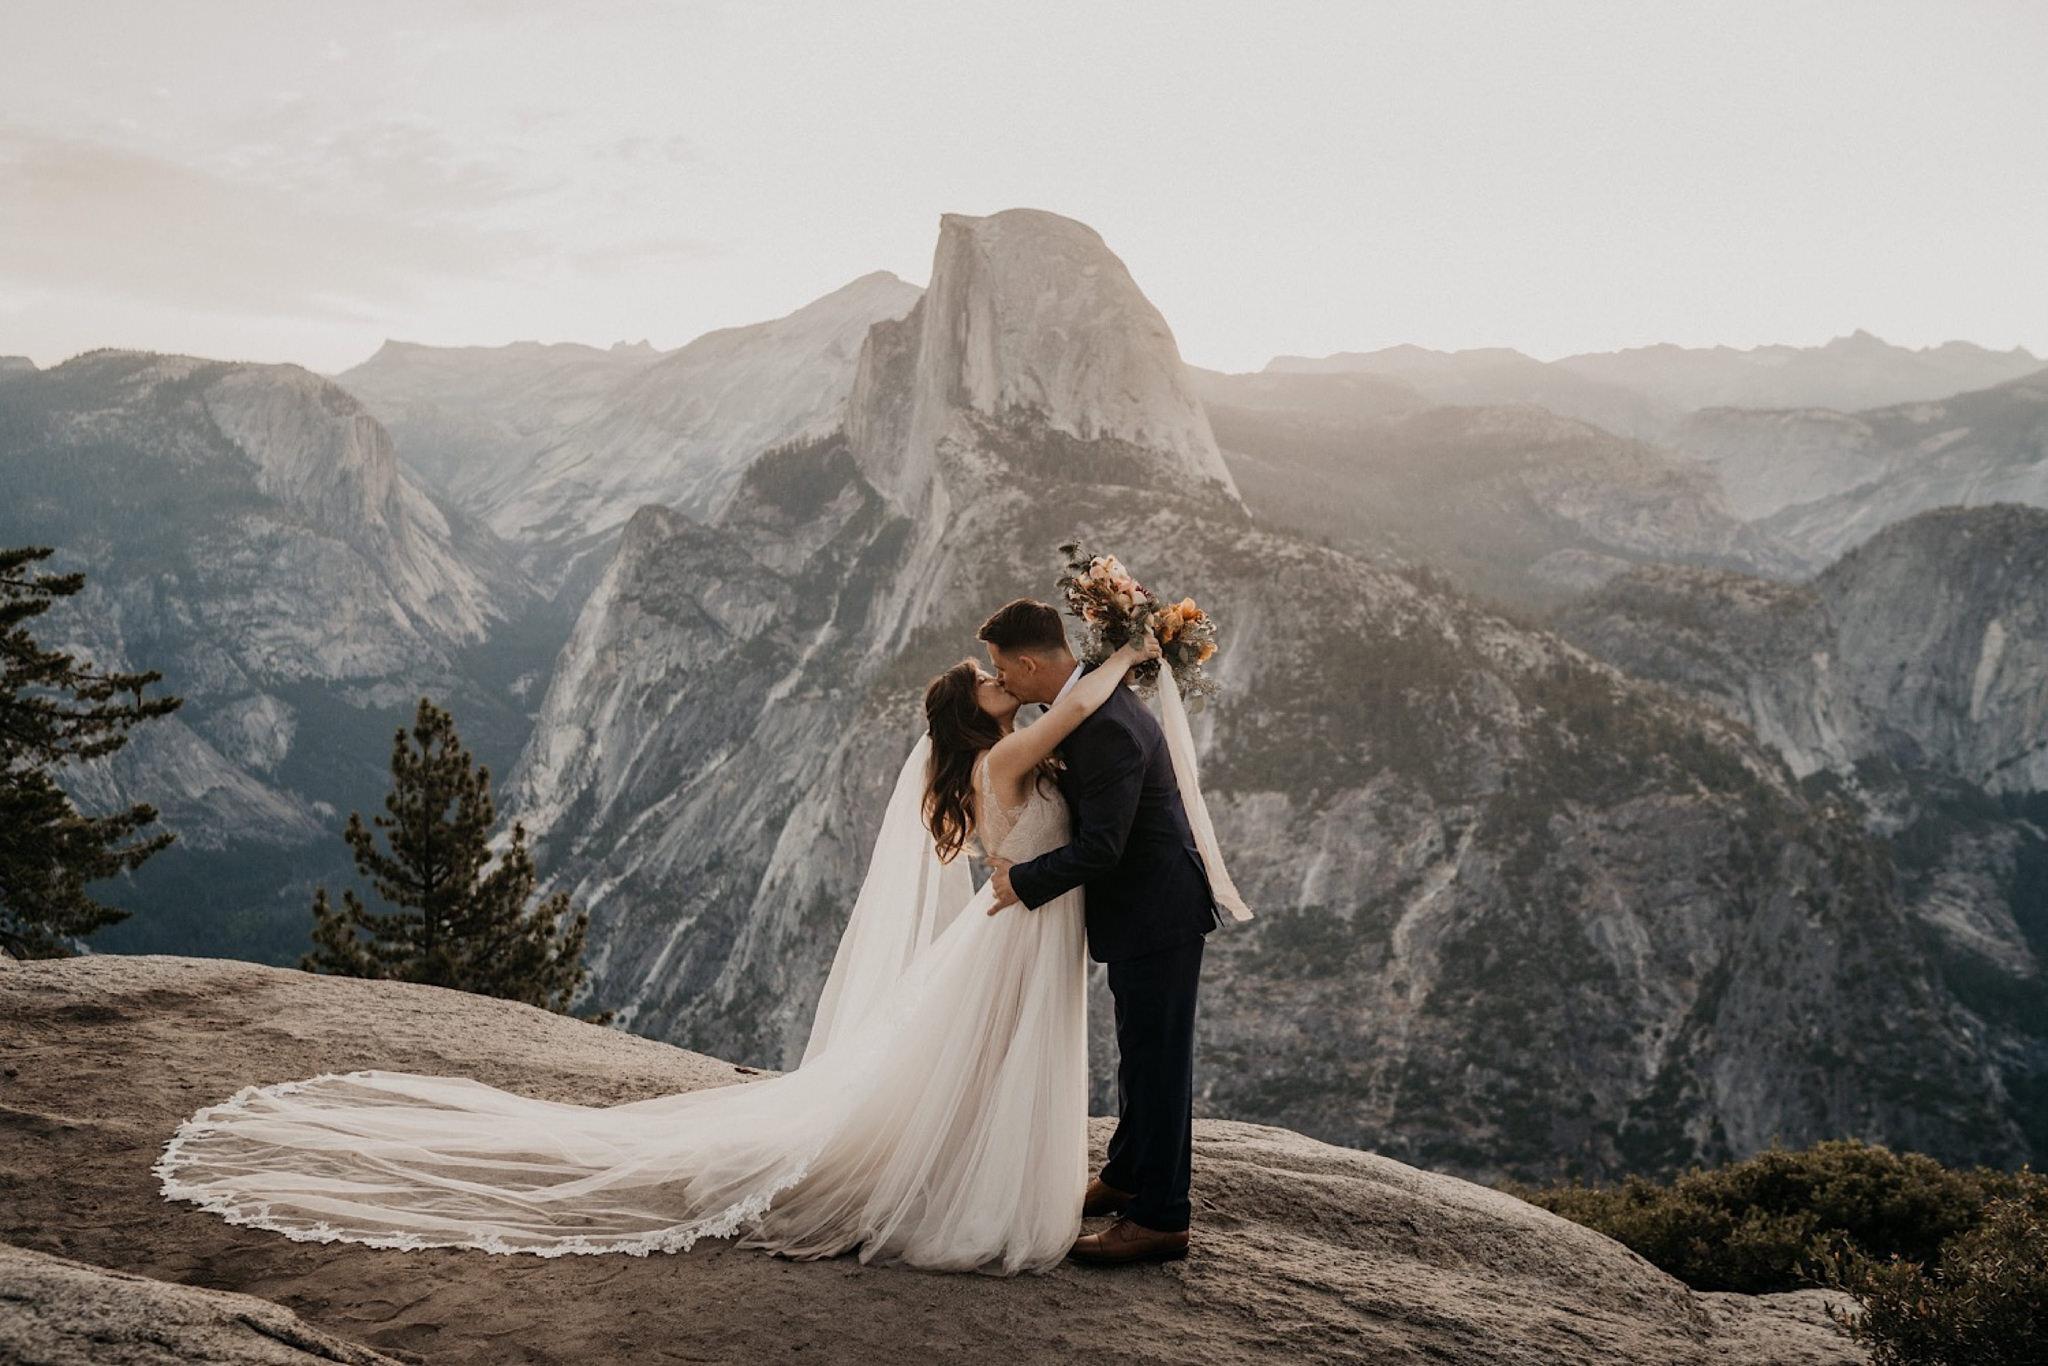 Yosemite National Park wedding photography and planning